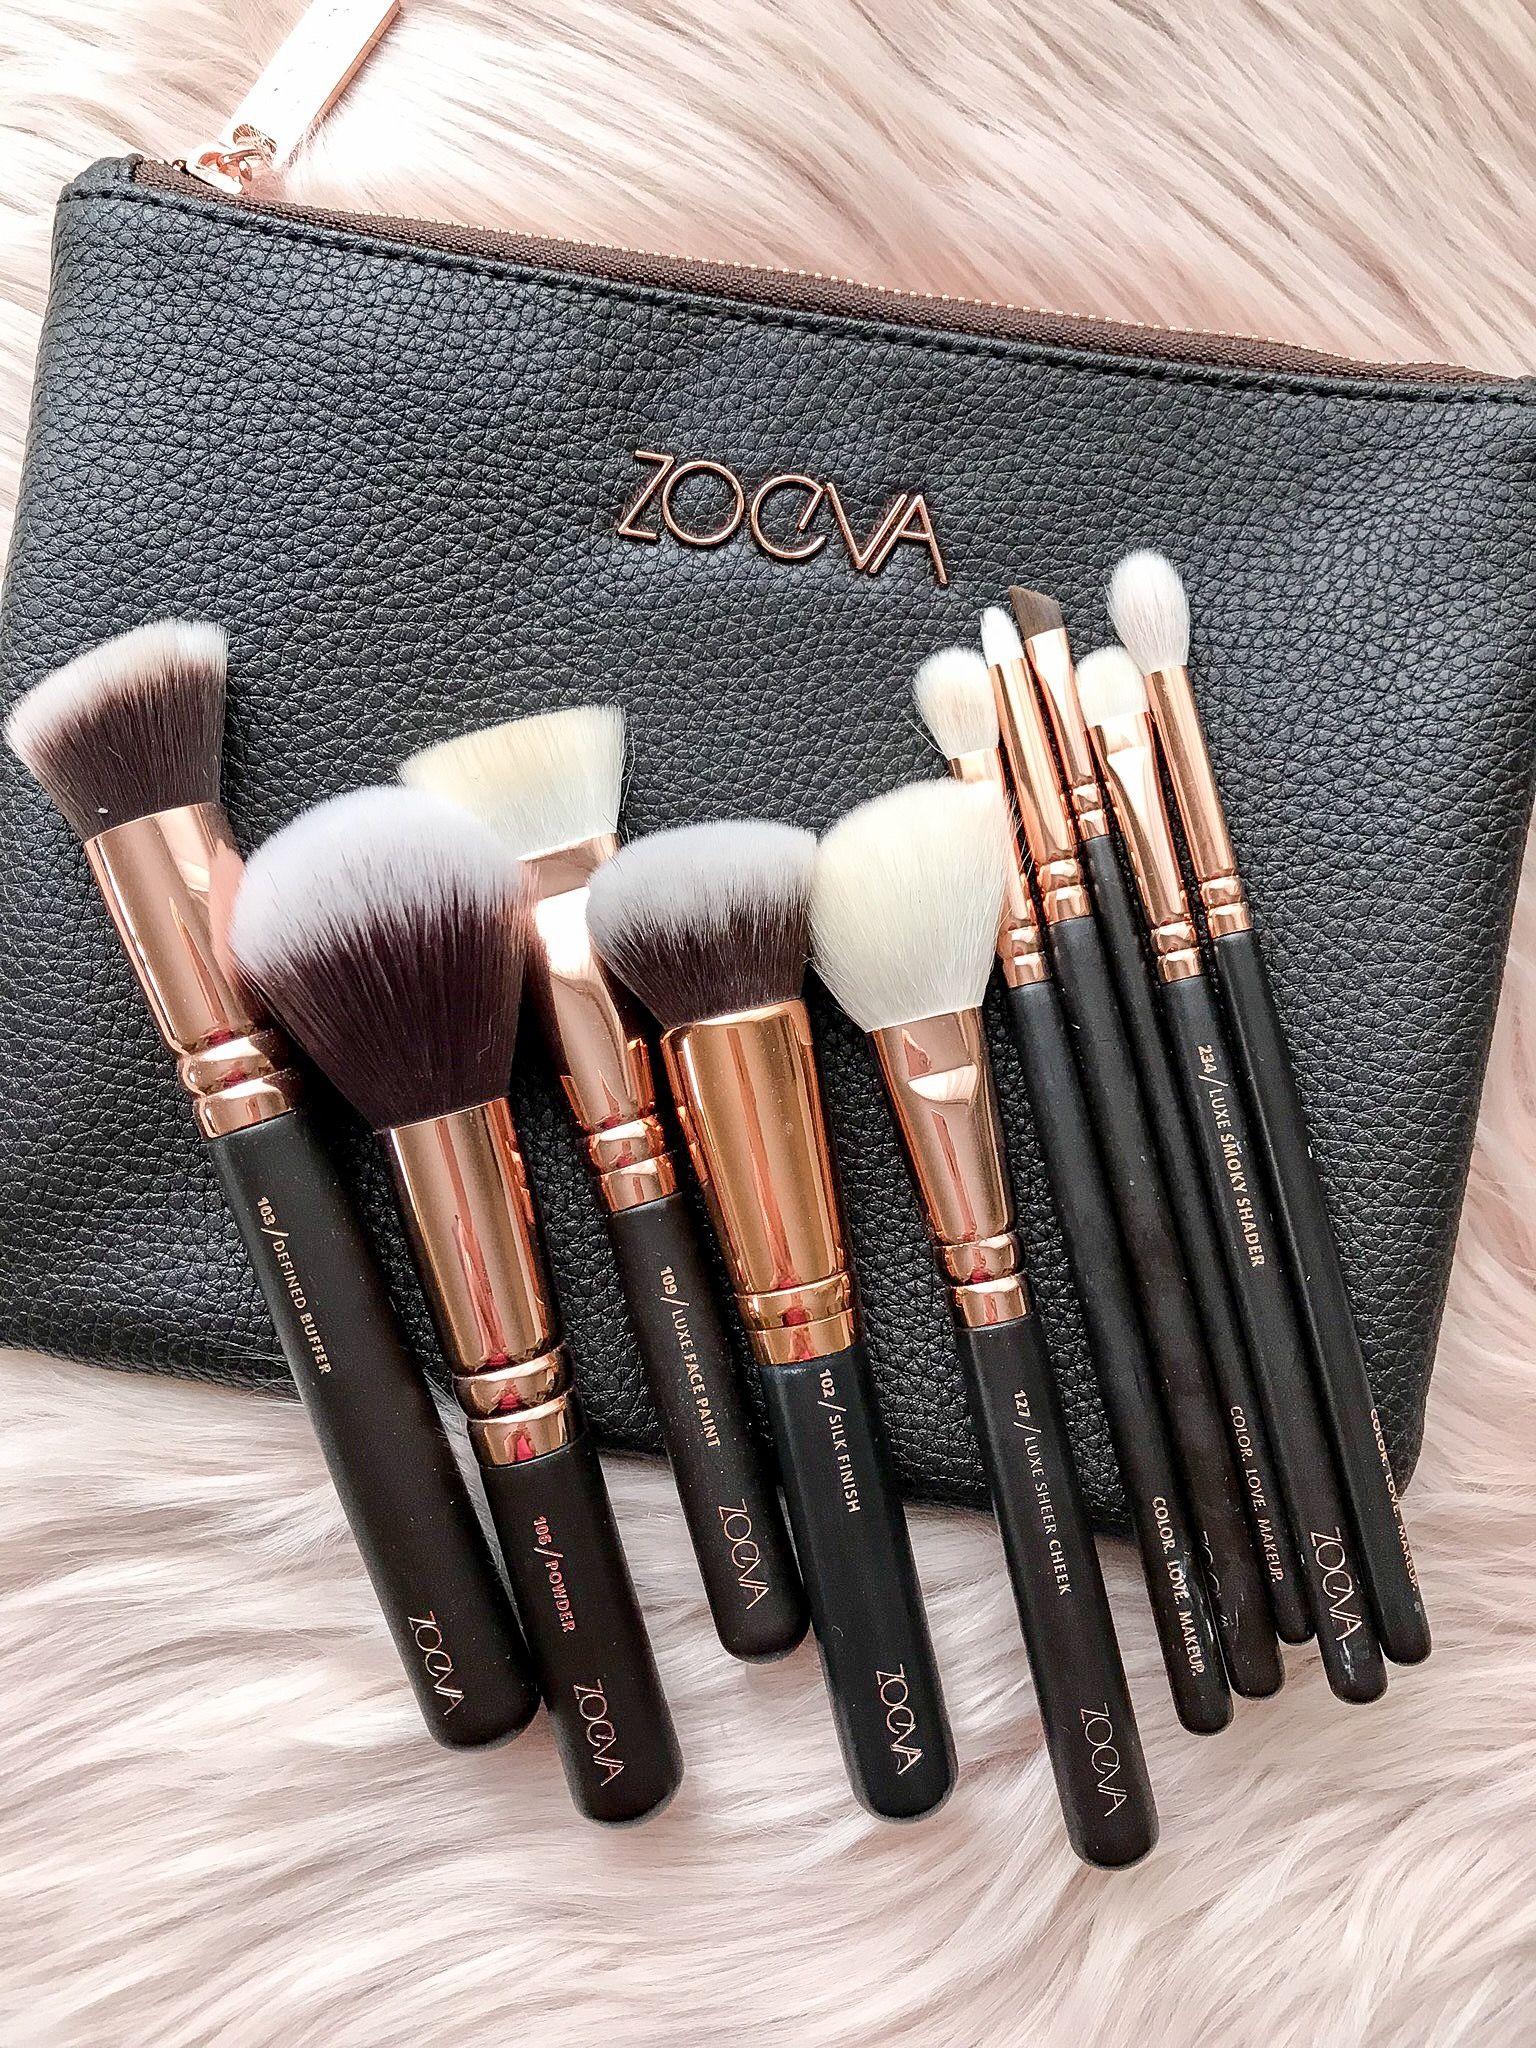 Zoeva Rose Golden Luxury Set #Ad #Cosmeticbrushes #Makeupbrushes #Zoeva #